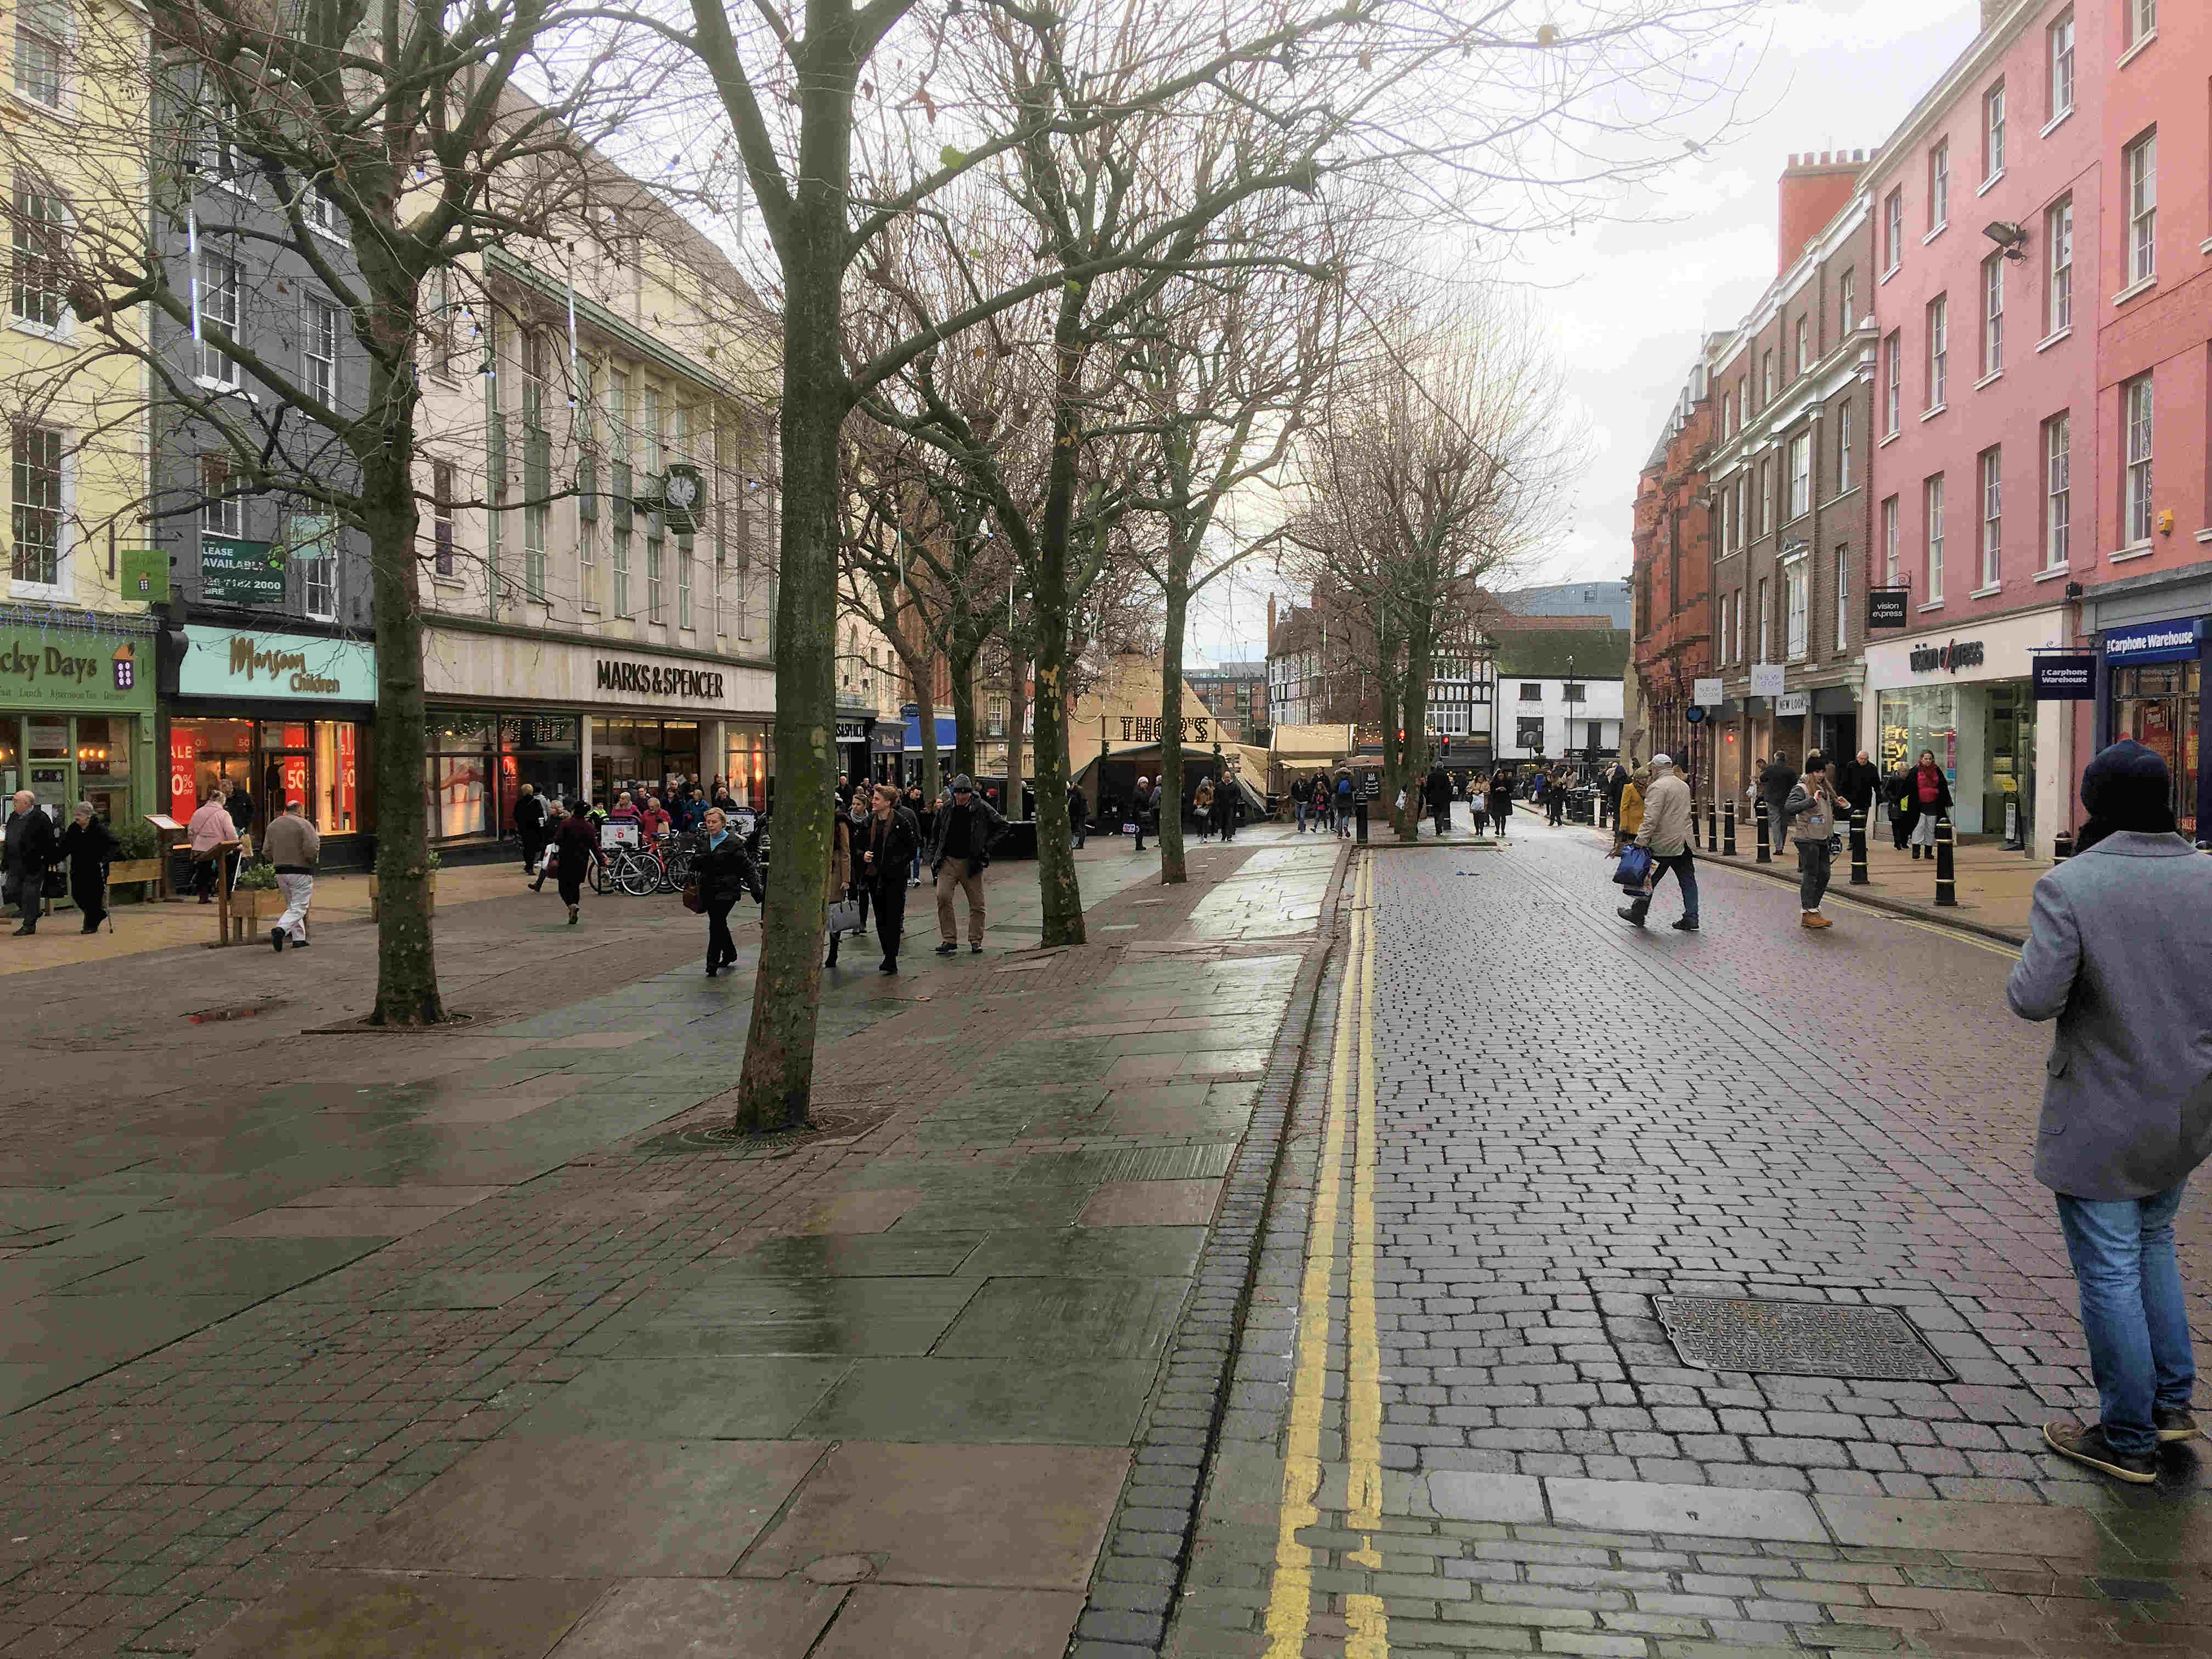 Parliament Street quiet since Chrsitmas